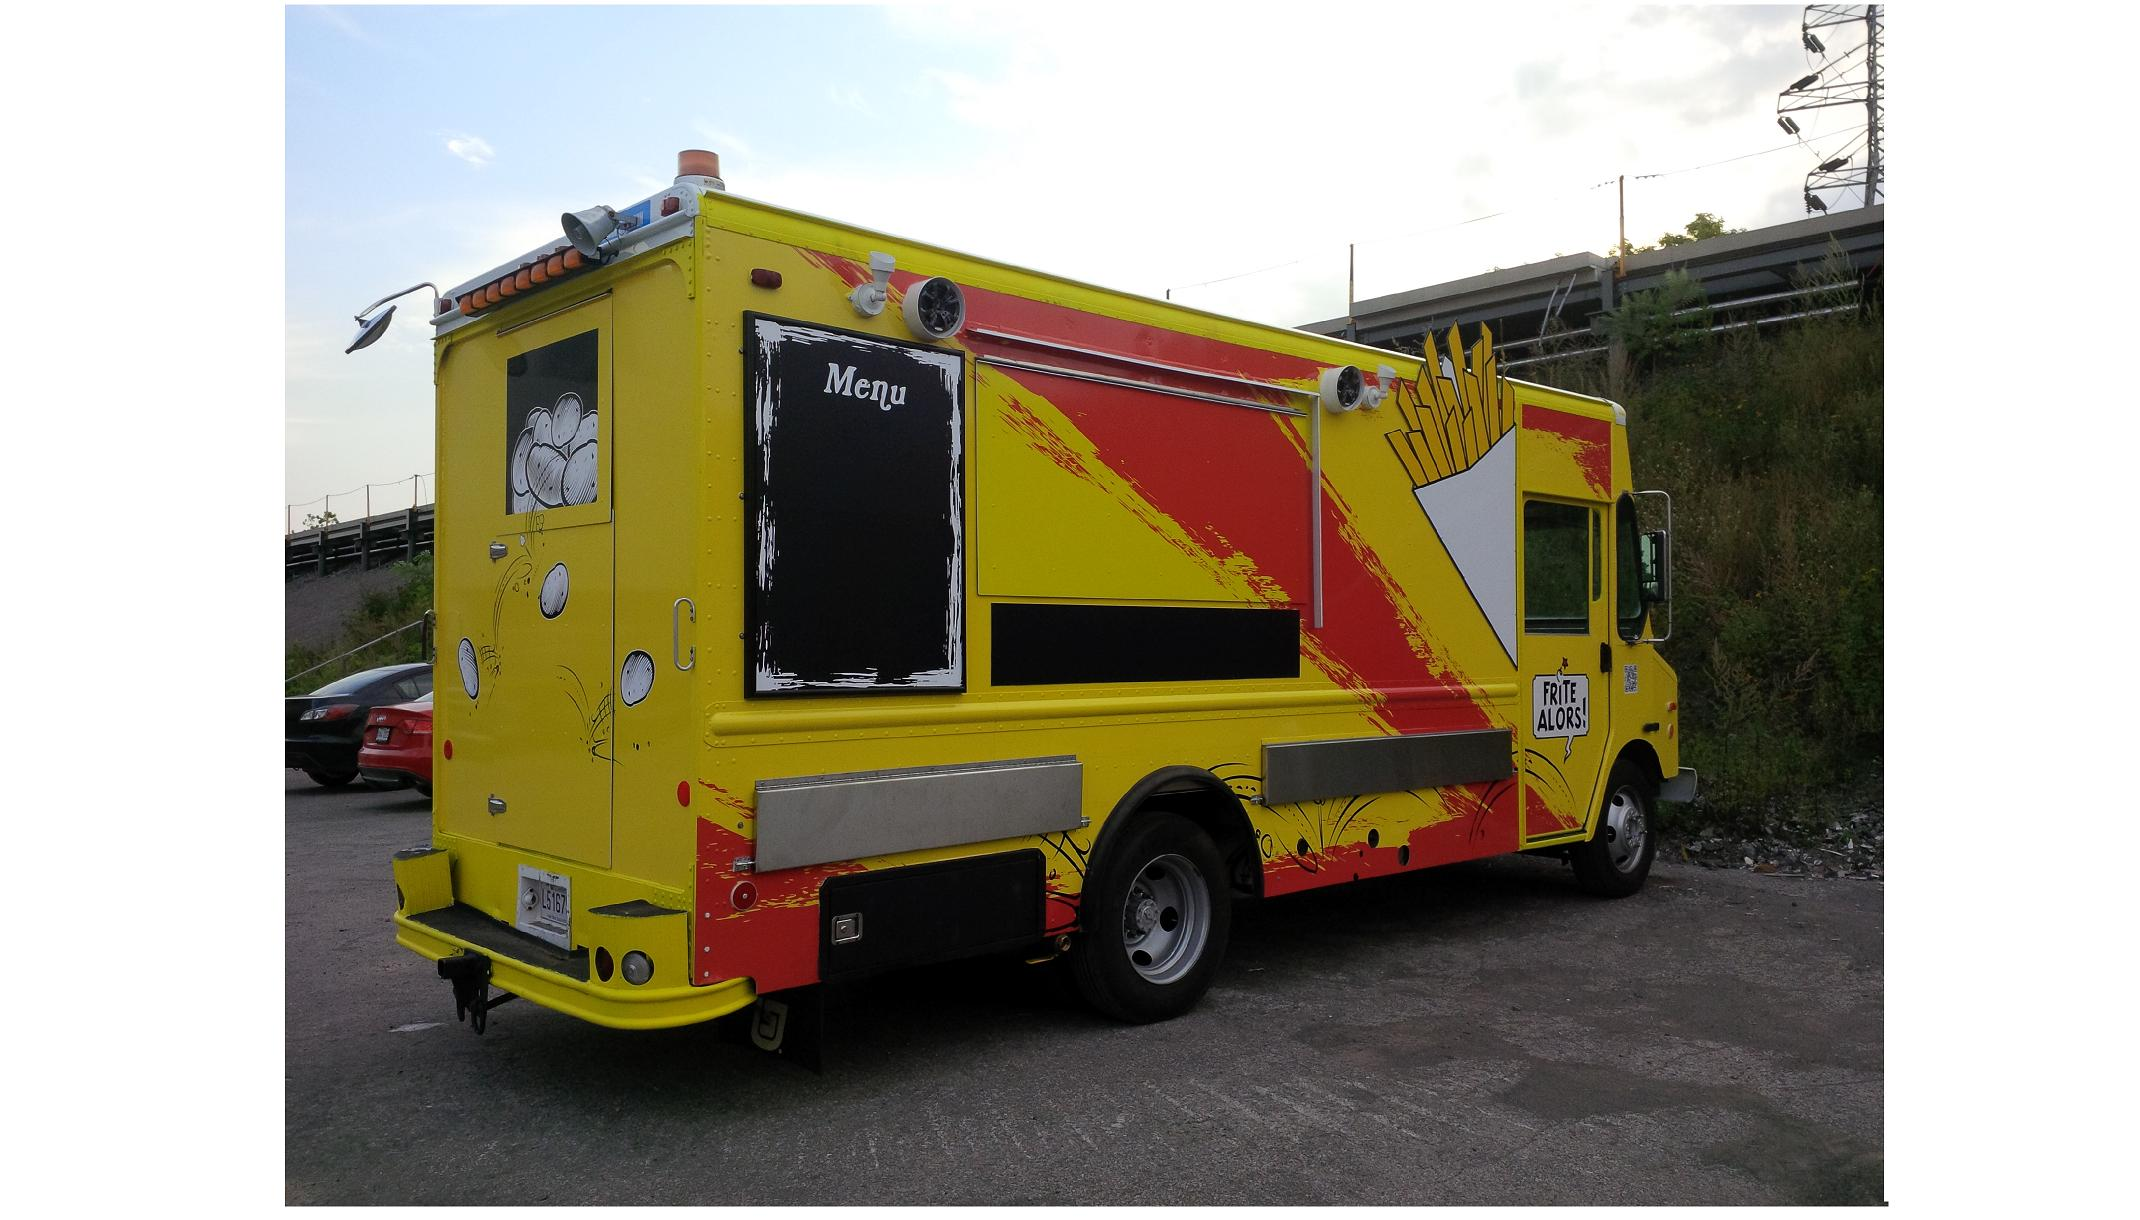 Frite Alors Food Truck